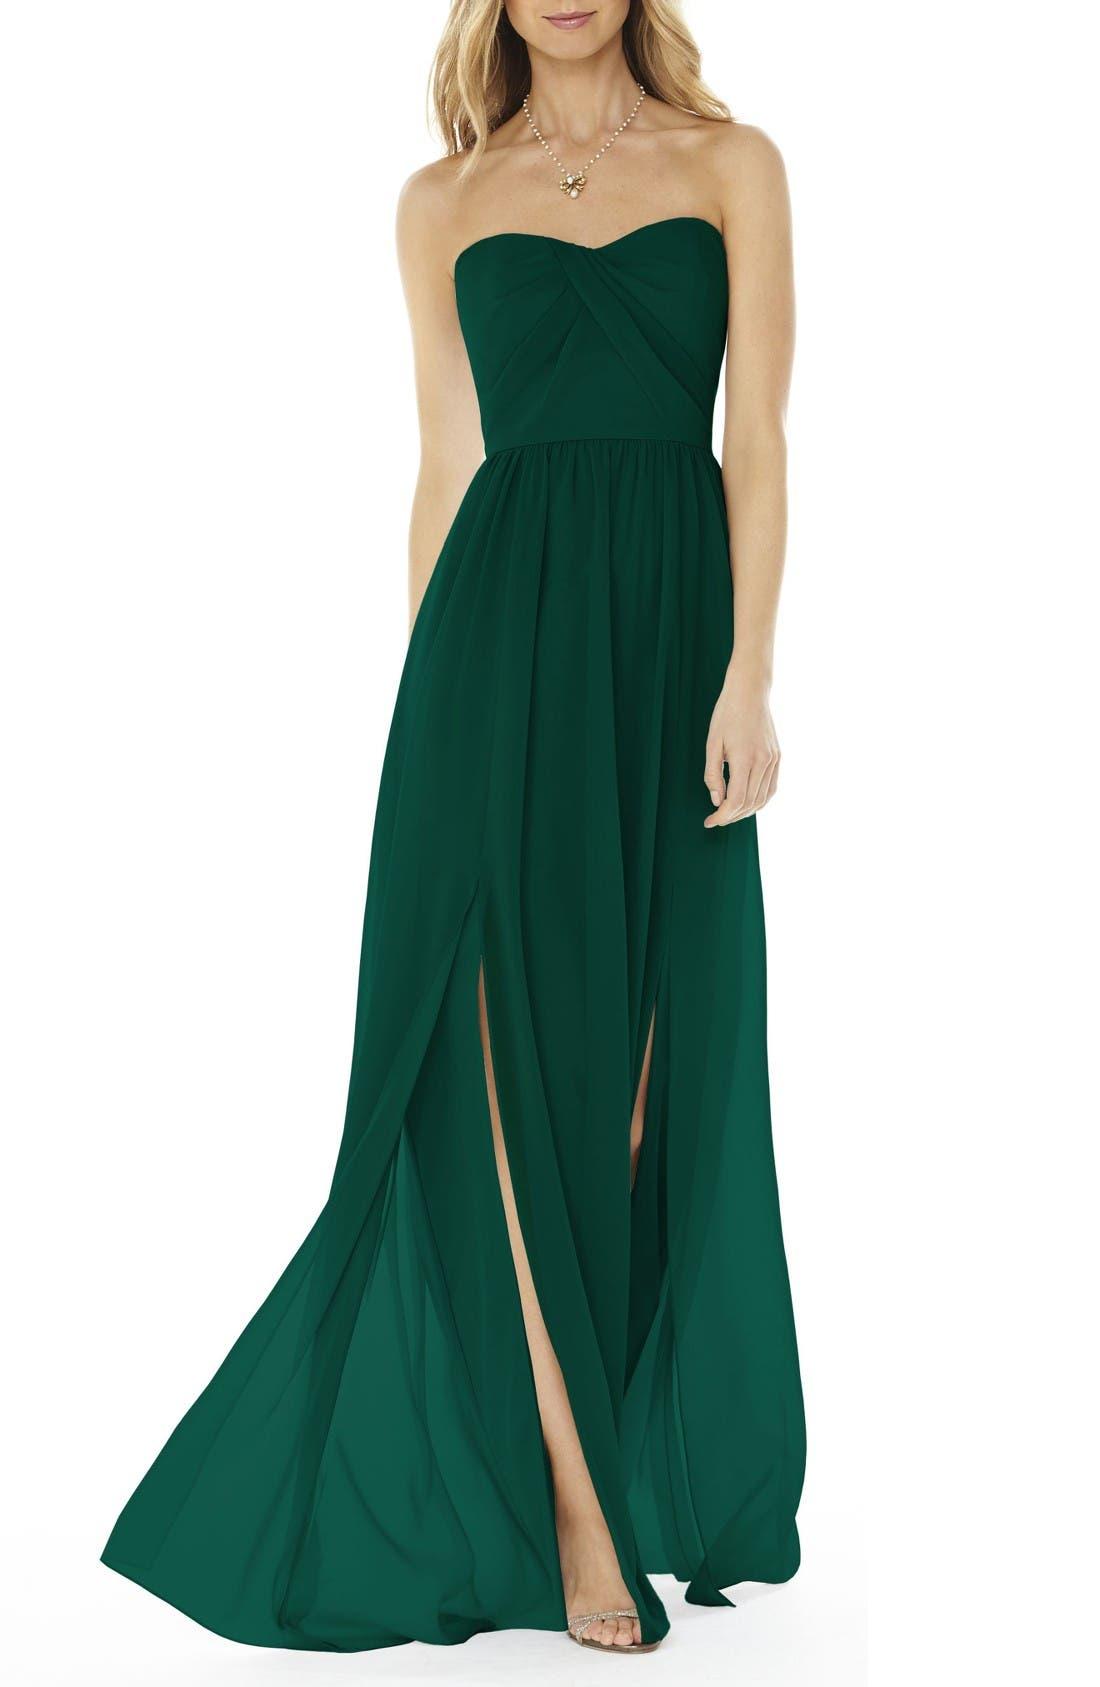 Kelly Green Knee Length Dress